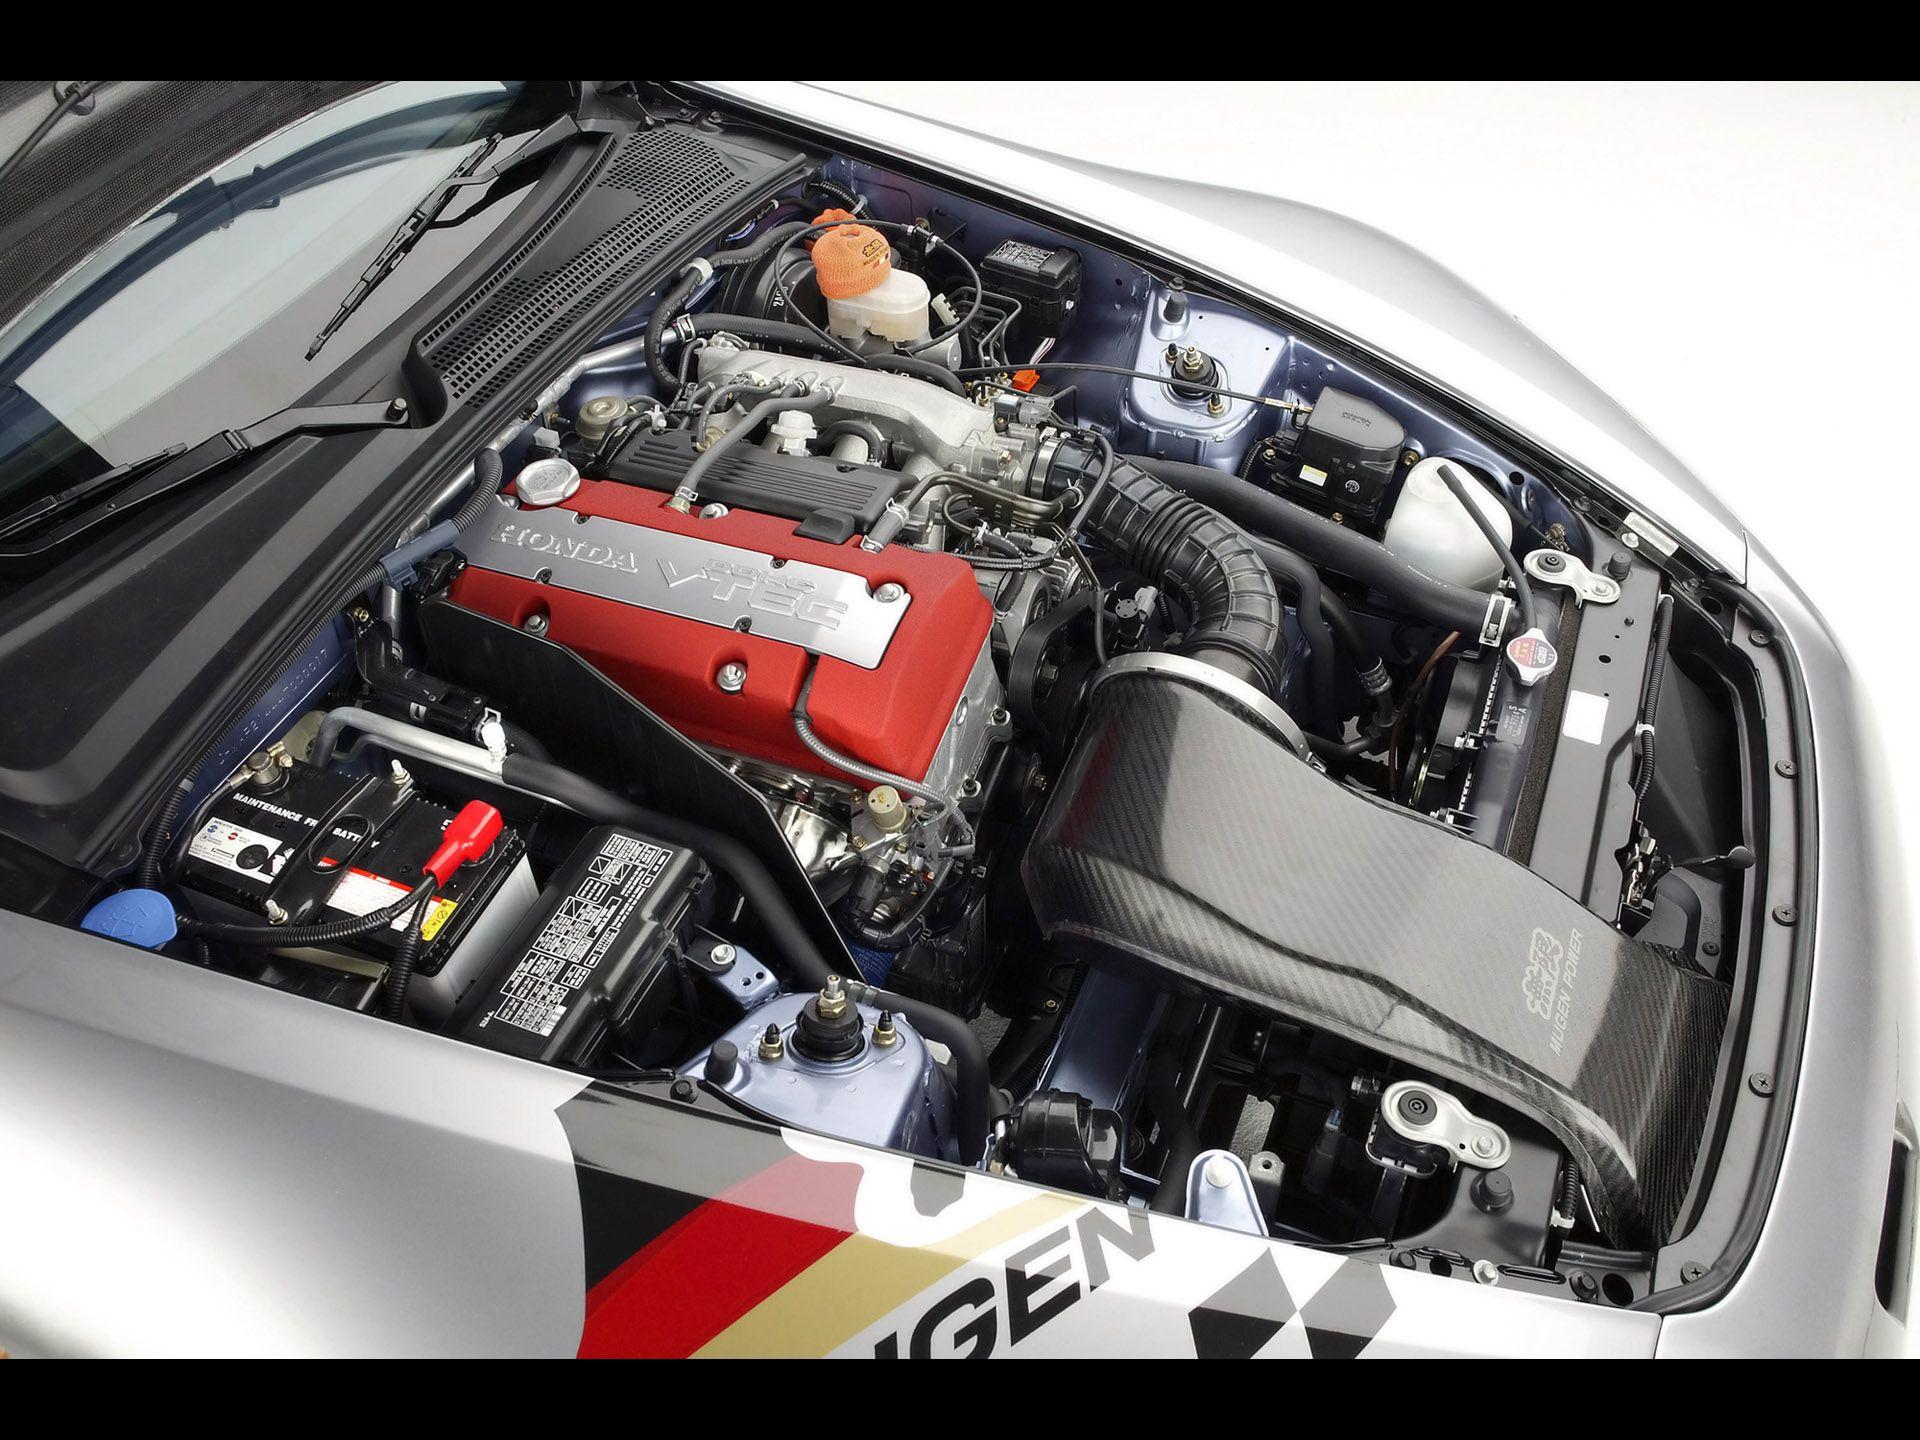 2005 King Motorsports Mugen Honda S2000 Engine Compartment 1920x1440 Wallpaper Honda S2000 Honda Super Cars